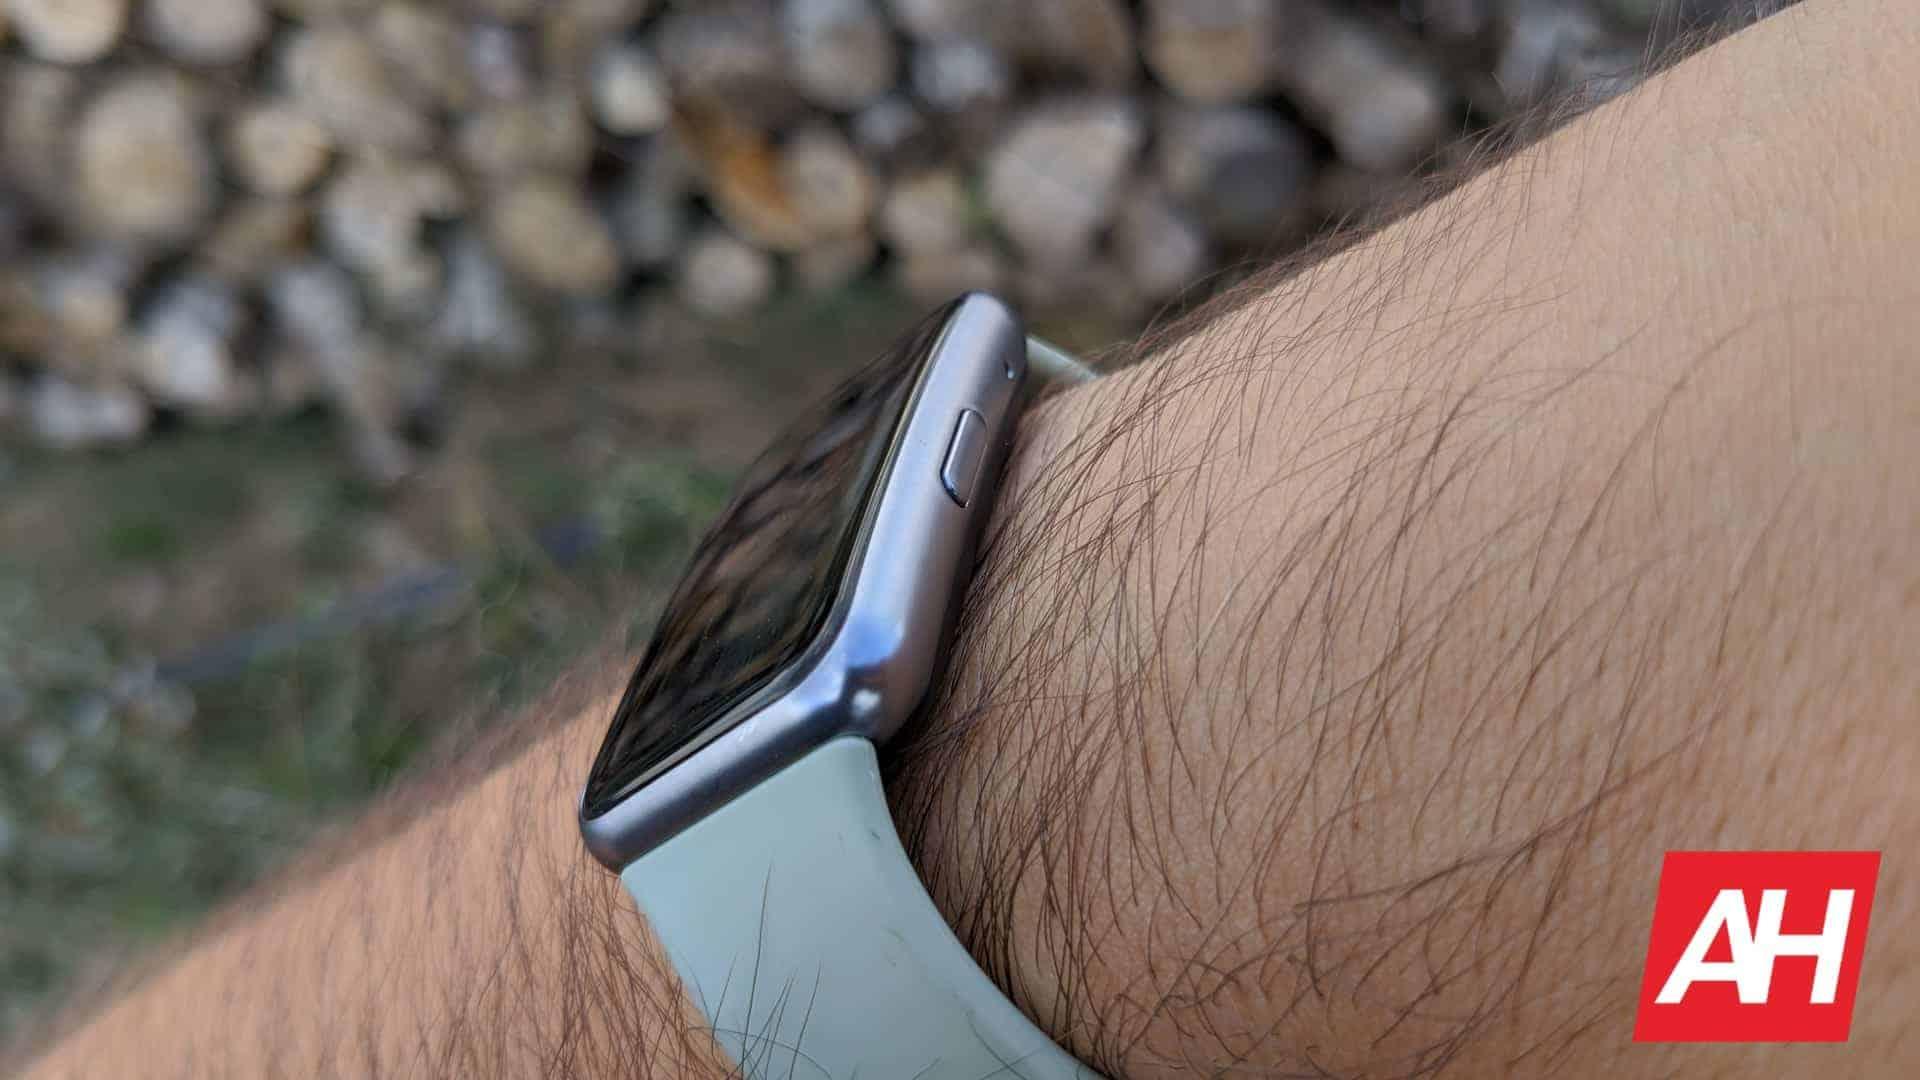 AH Huawei Watch Fit 13